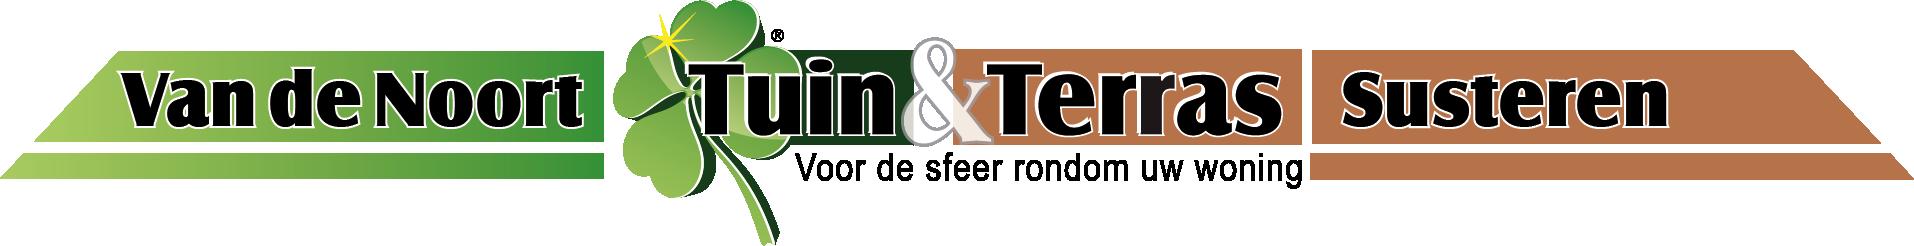 Tuin & Terras Susteren